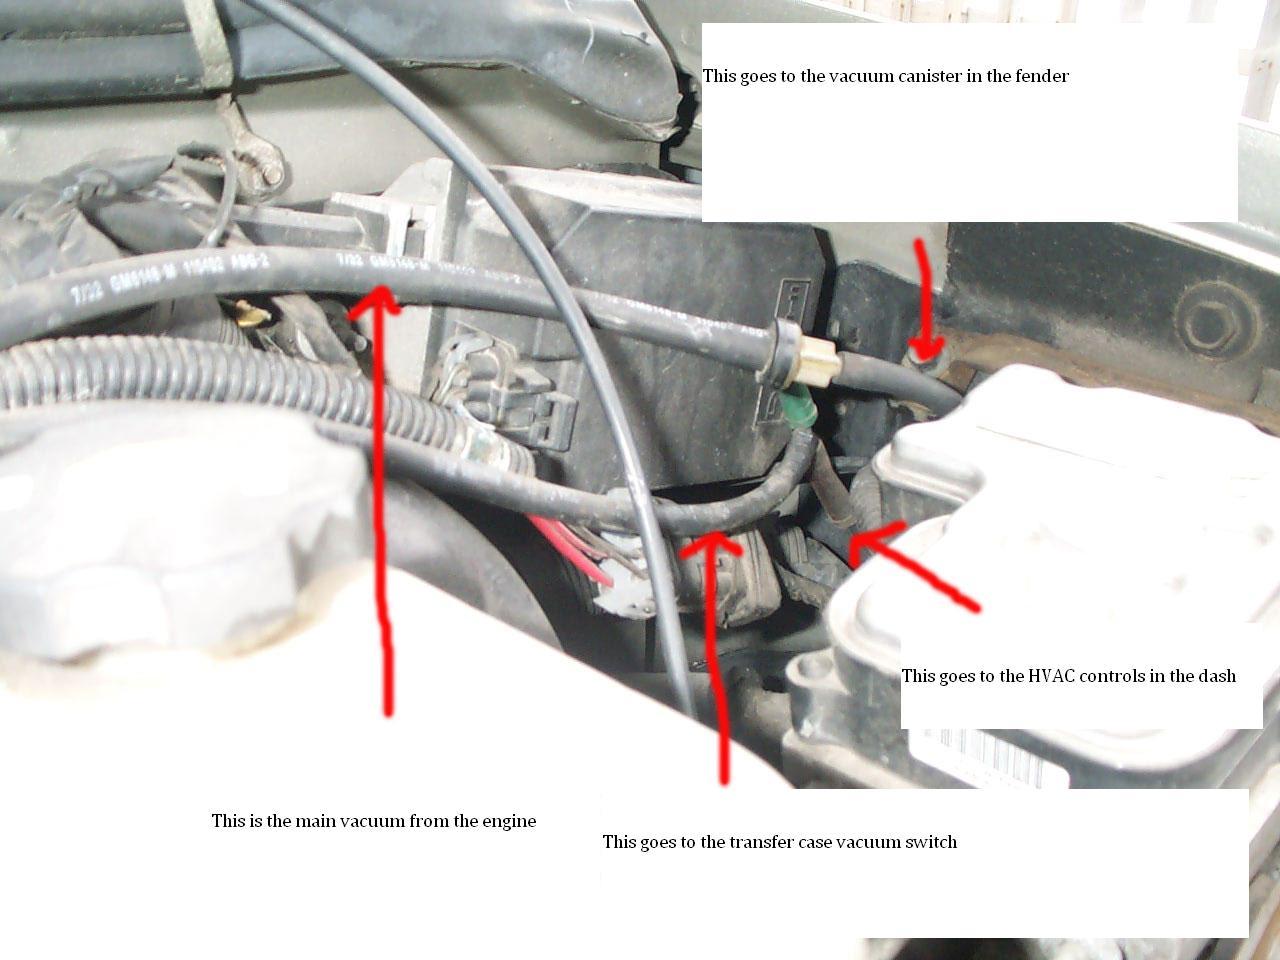 2000 chevy blazer wiring diagram 89 yamaha 350 warrior 1997 vacuum diagrams schematic 97 routing help forum forums 1998